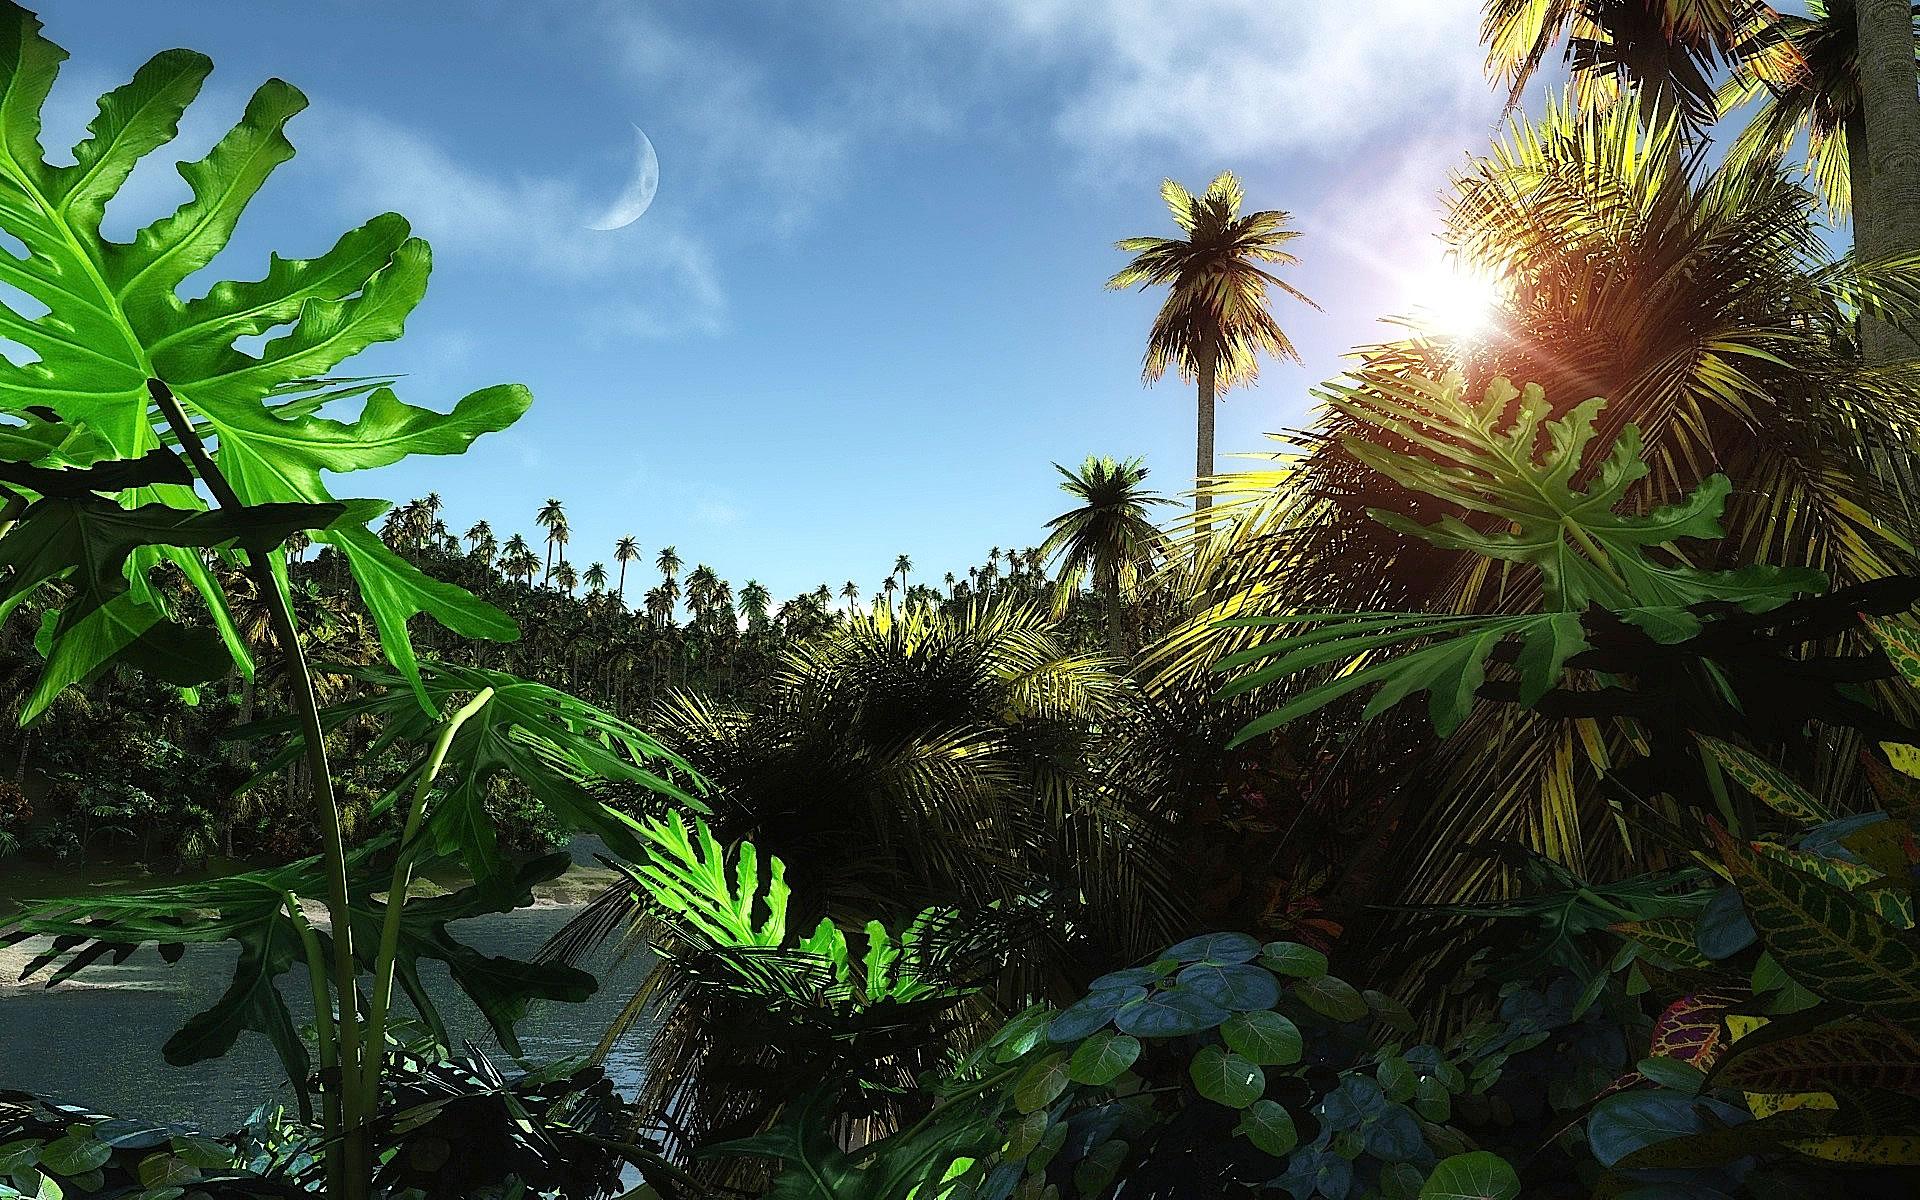 jungle trekking essay